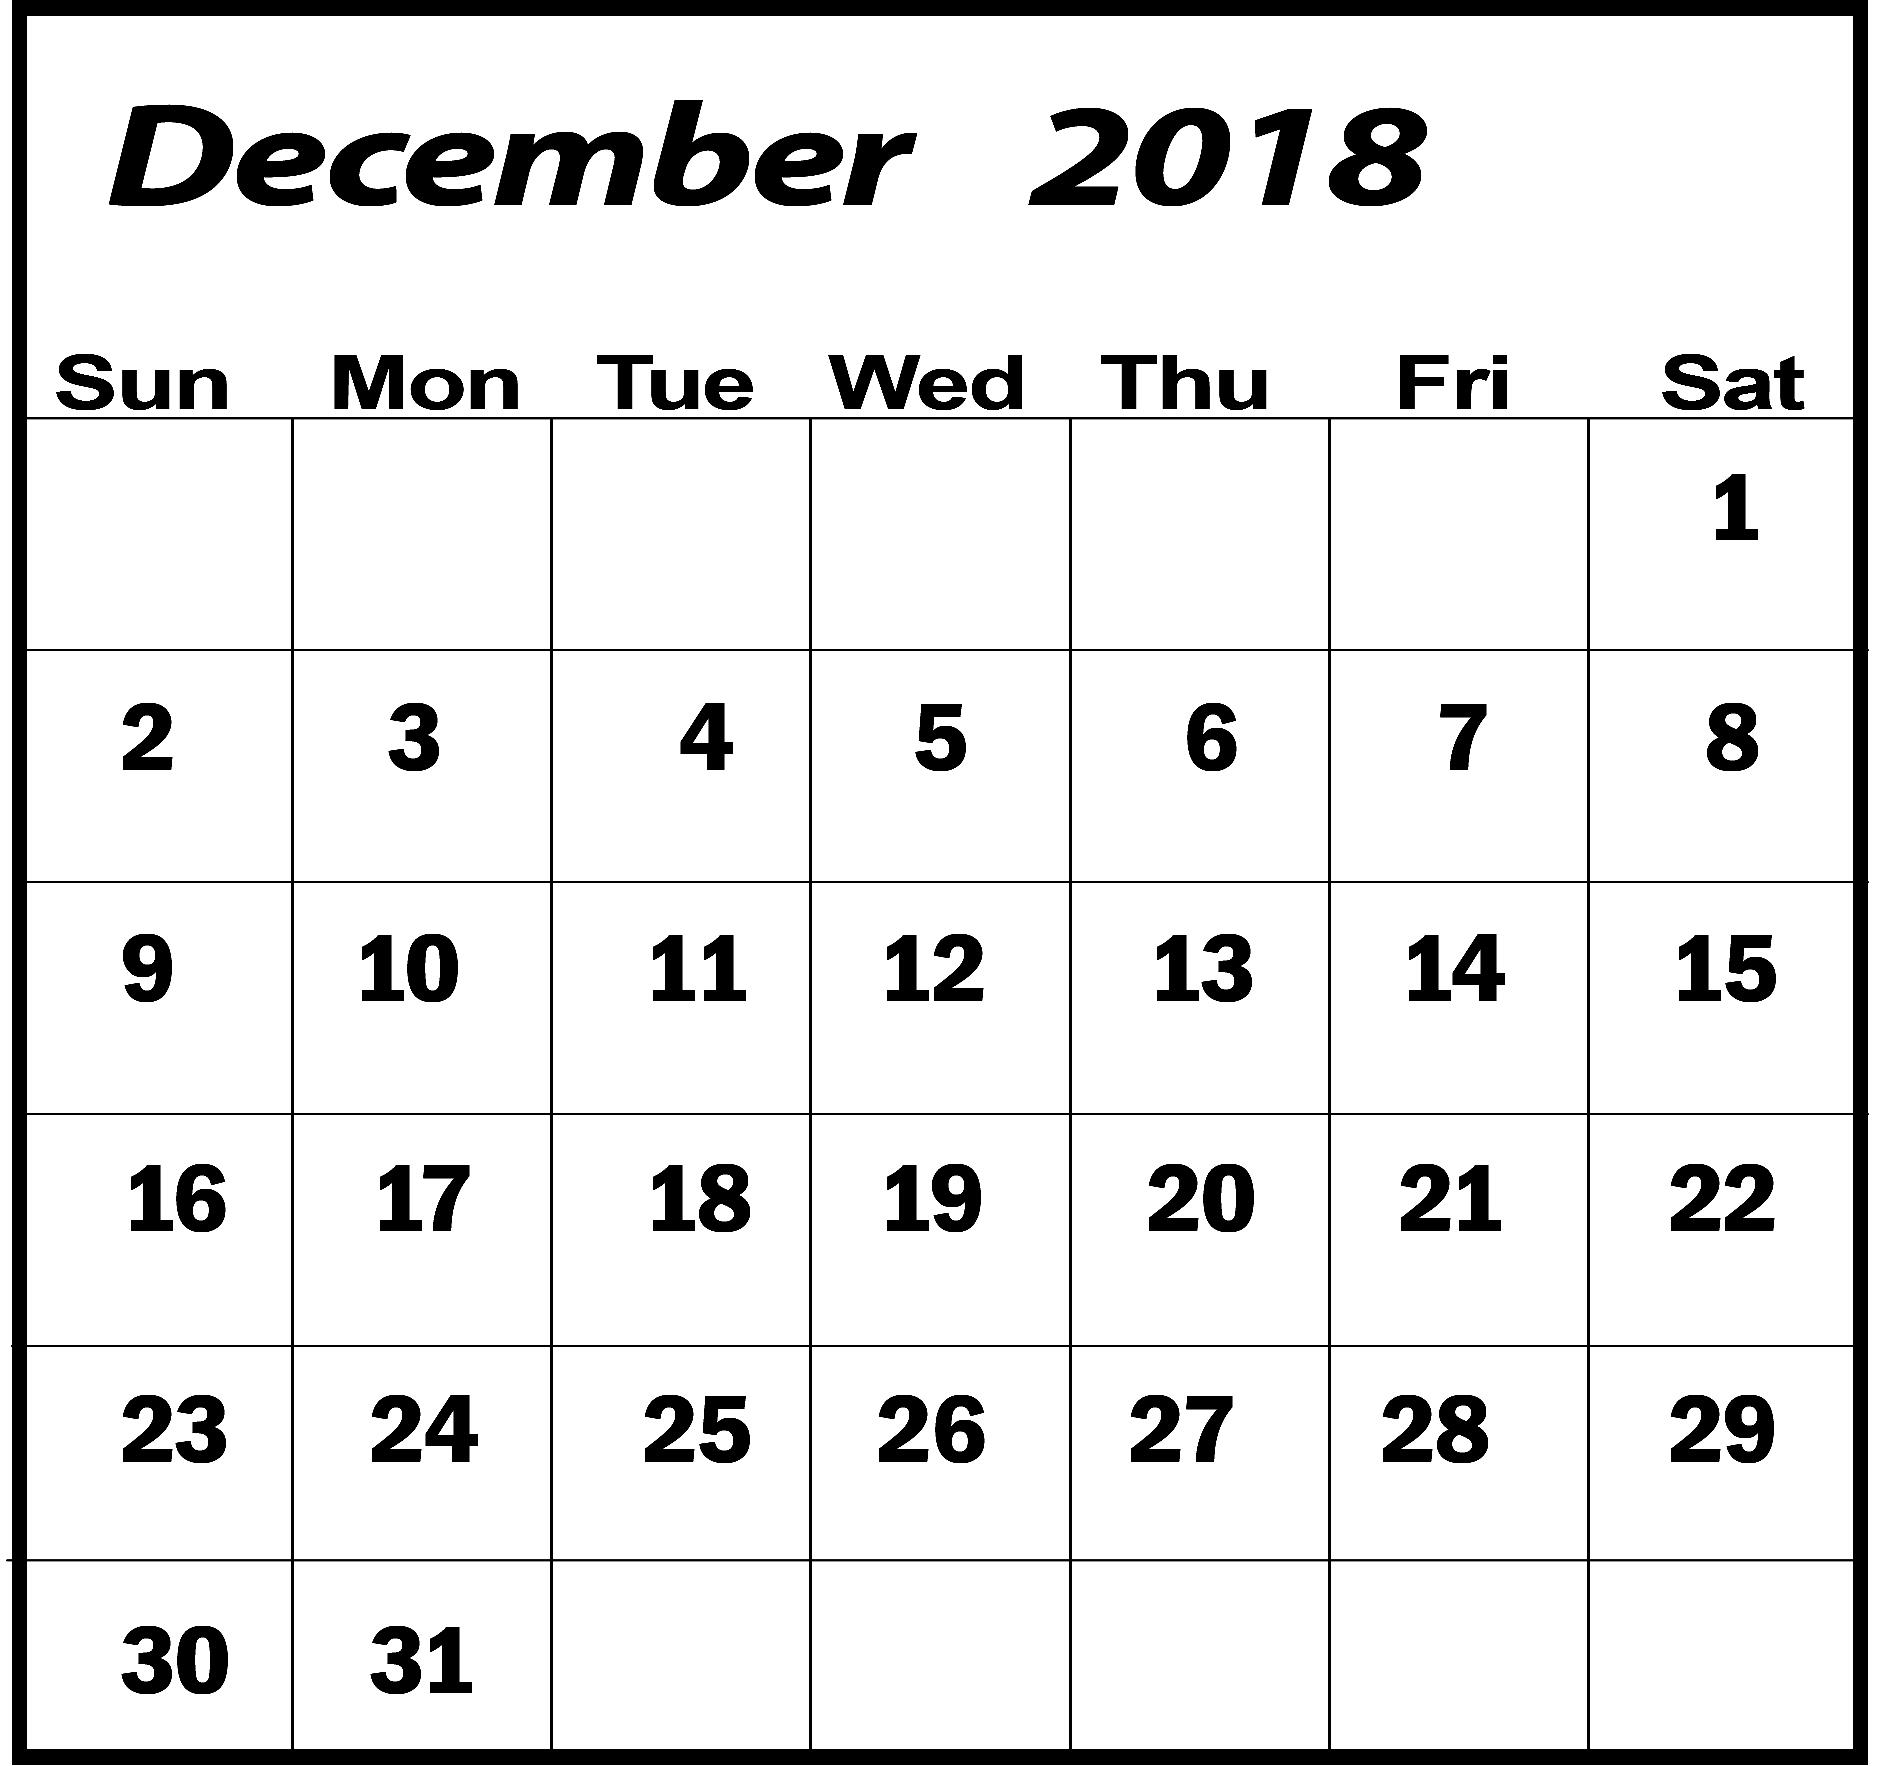 December 2018 Calendar Usa Printable Blank Template With